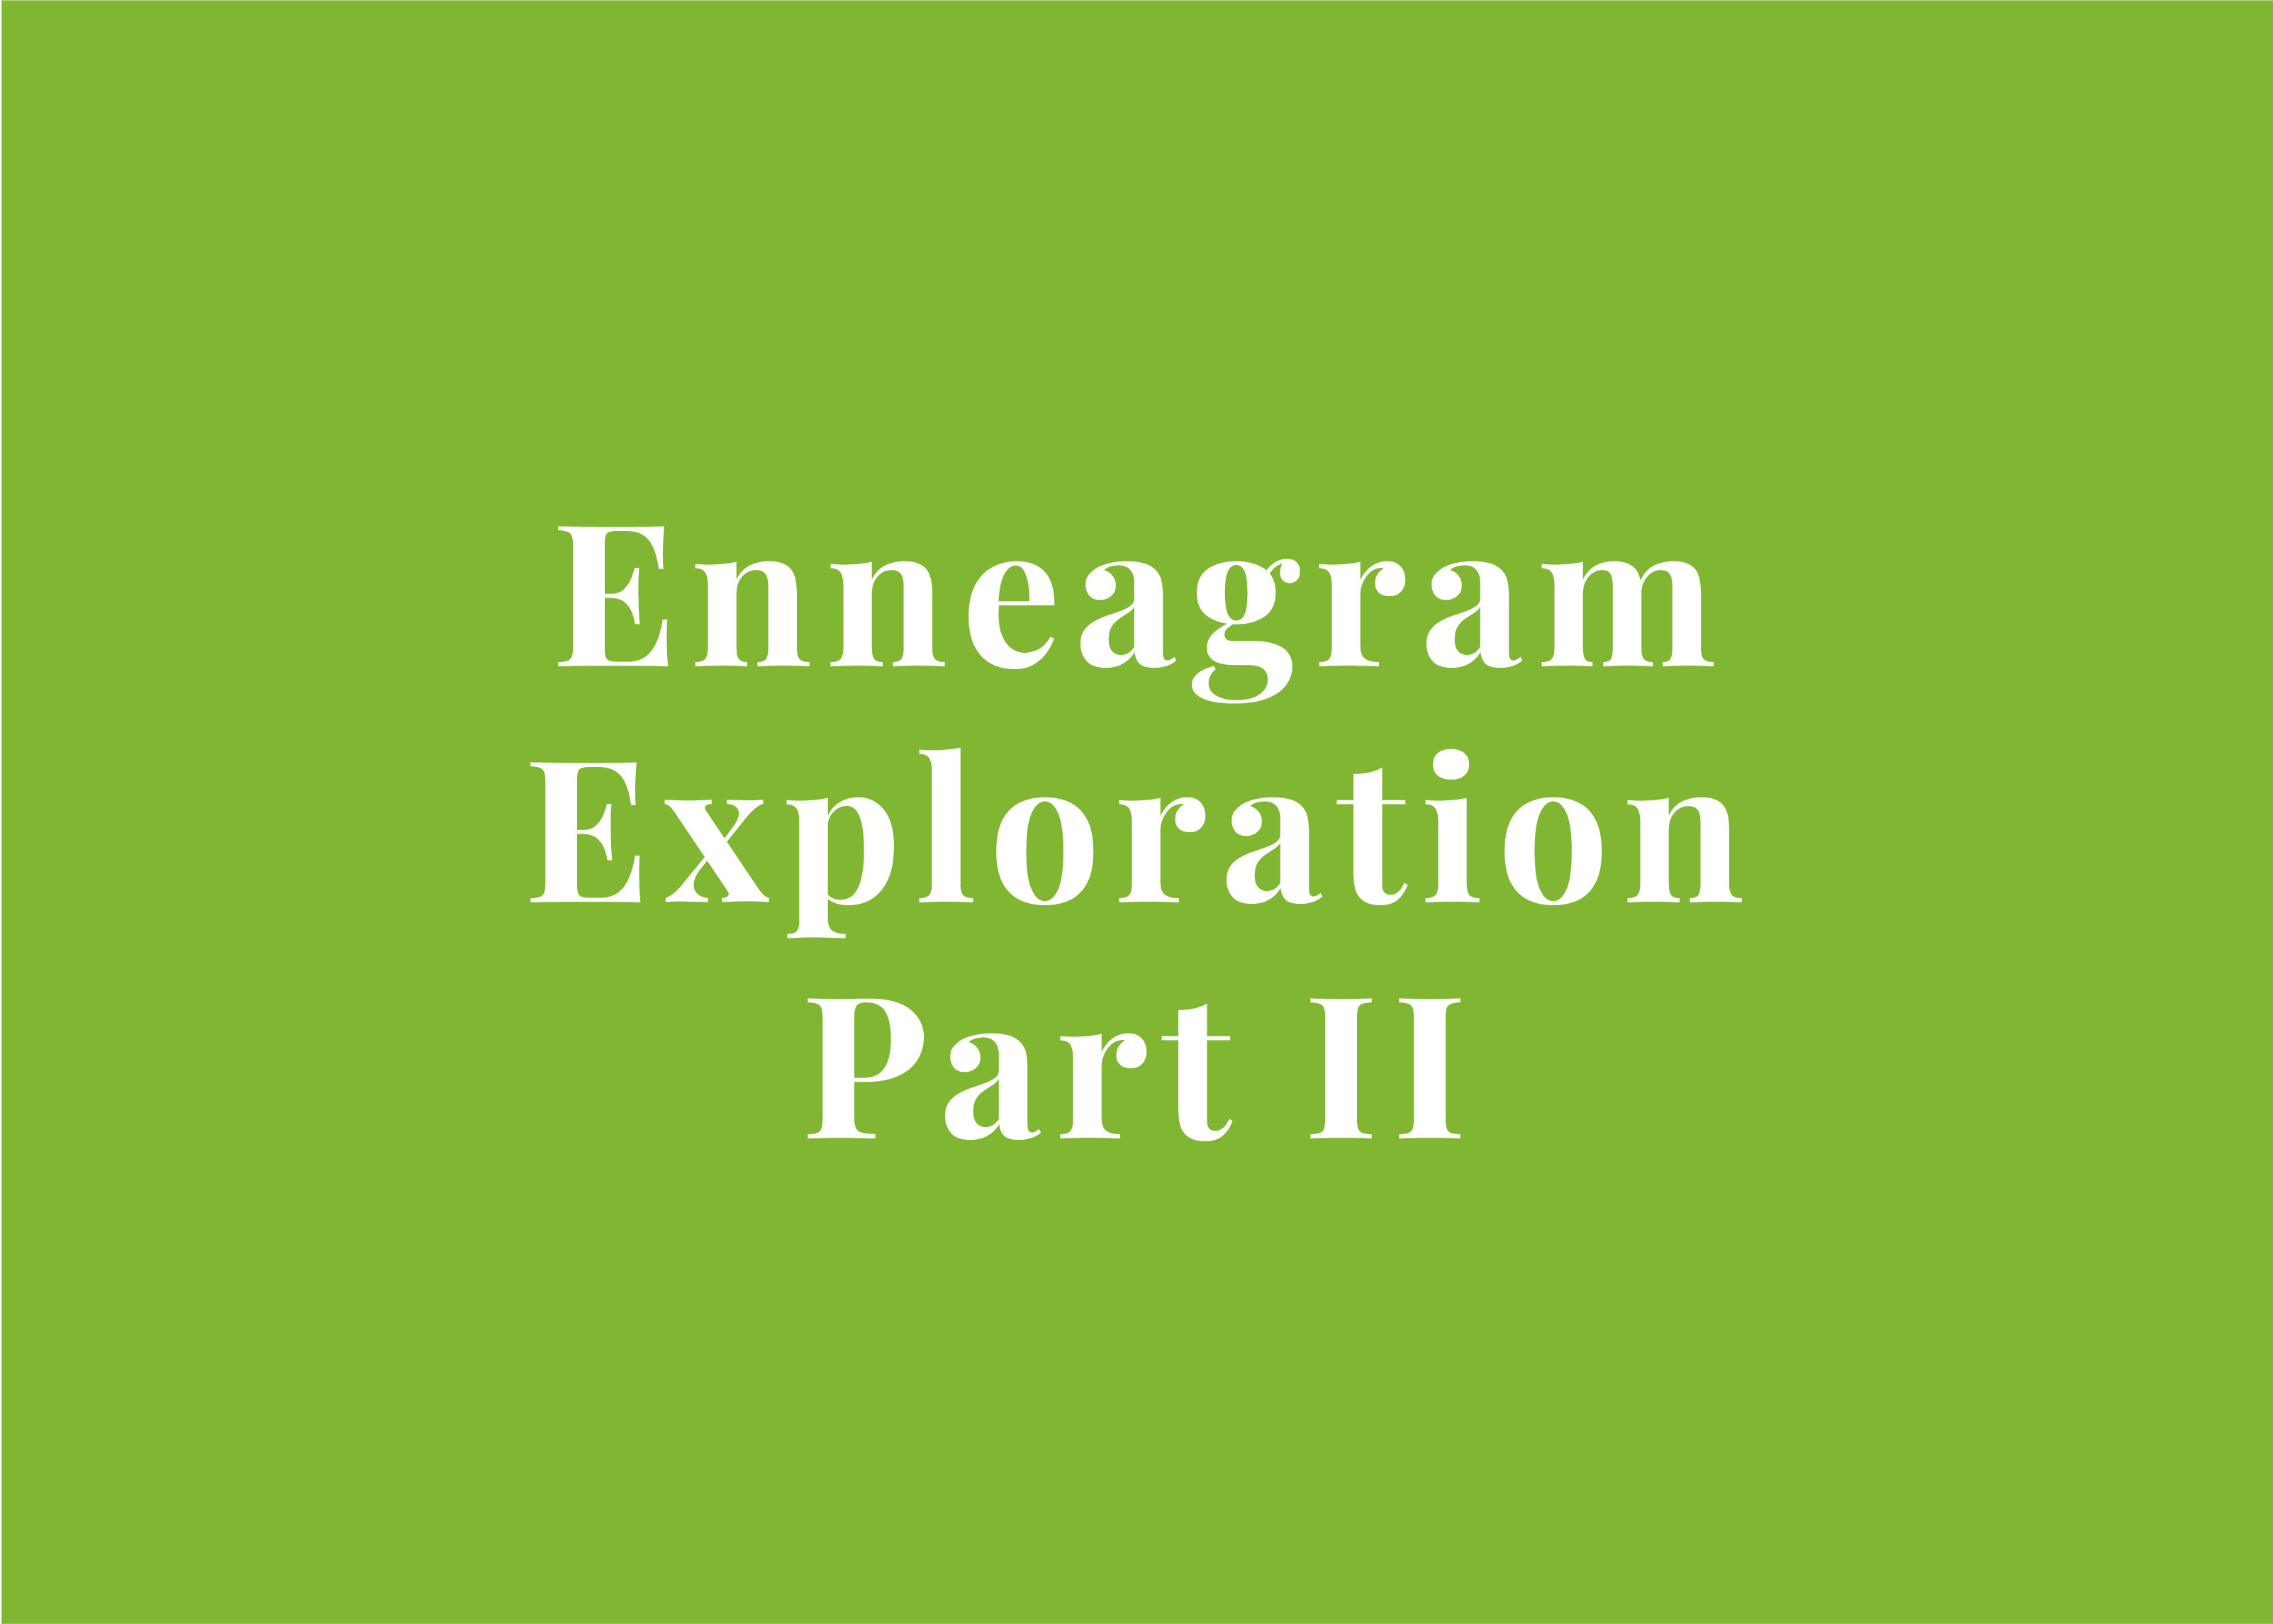 Enneagram Exploration Part II